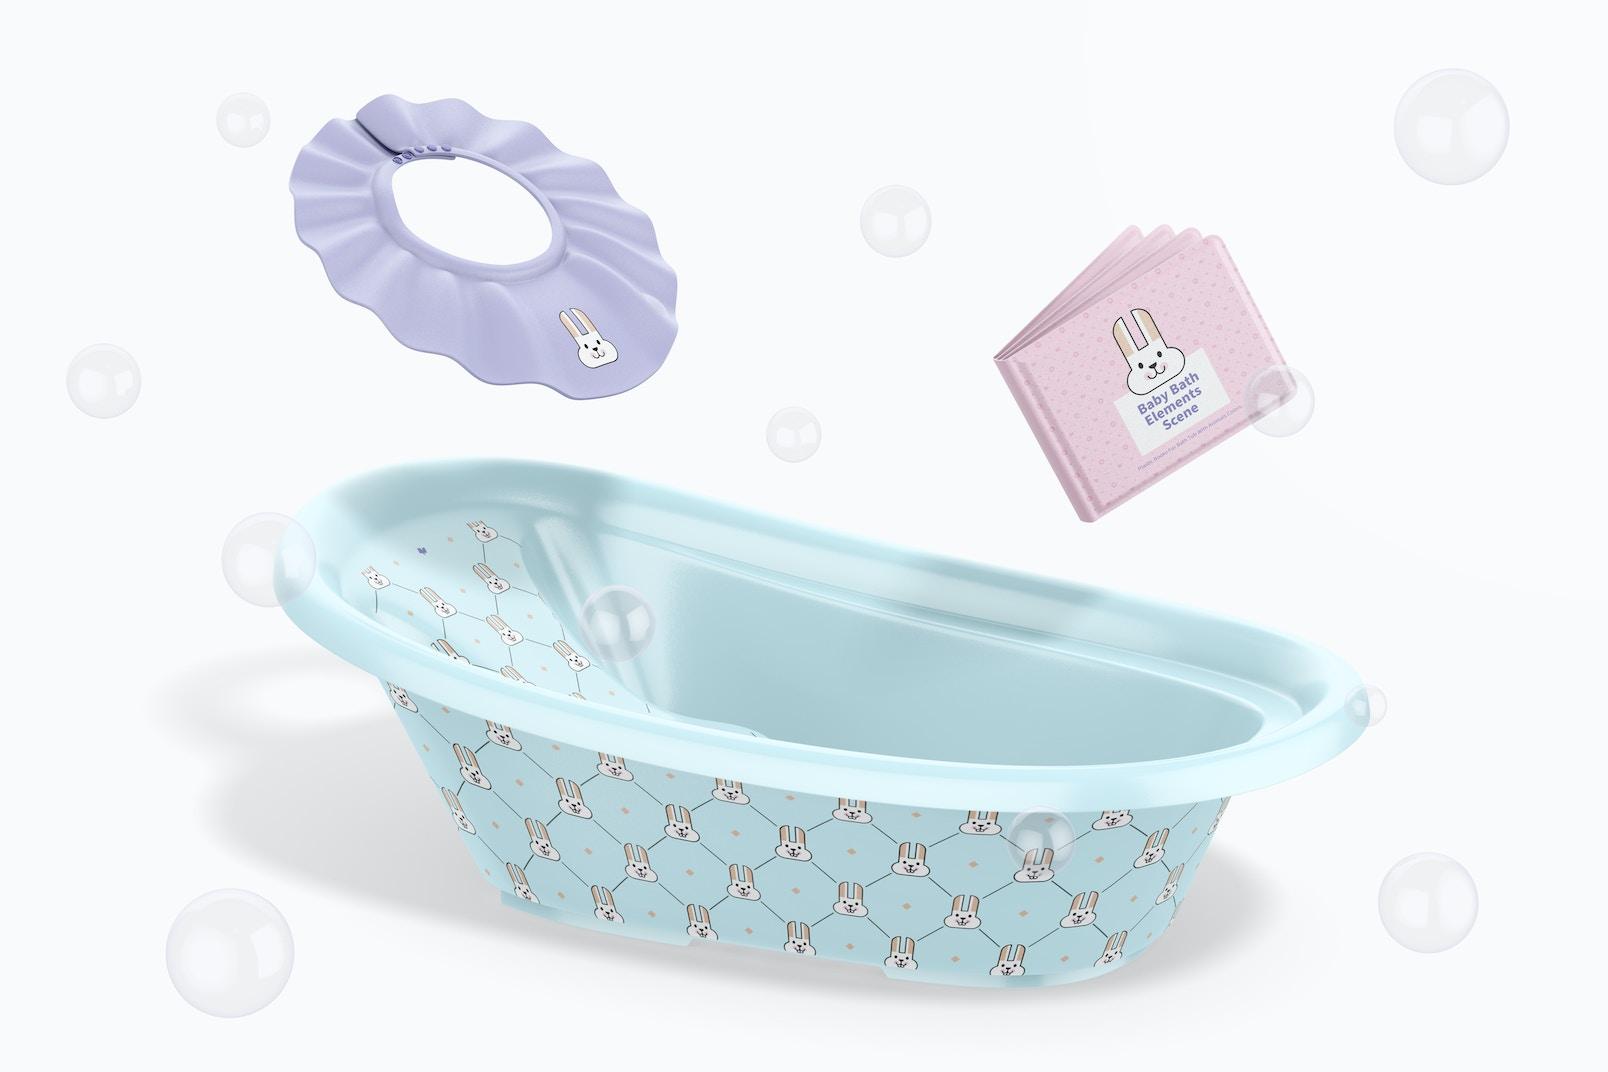 Baby Bath Elements Scene Mockup, Falling